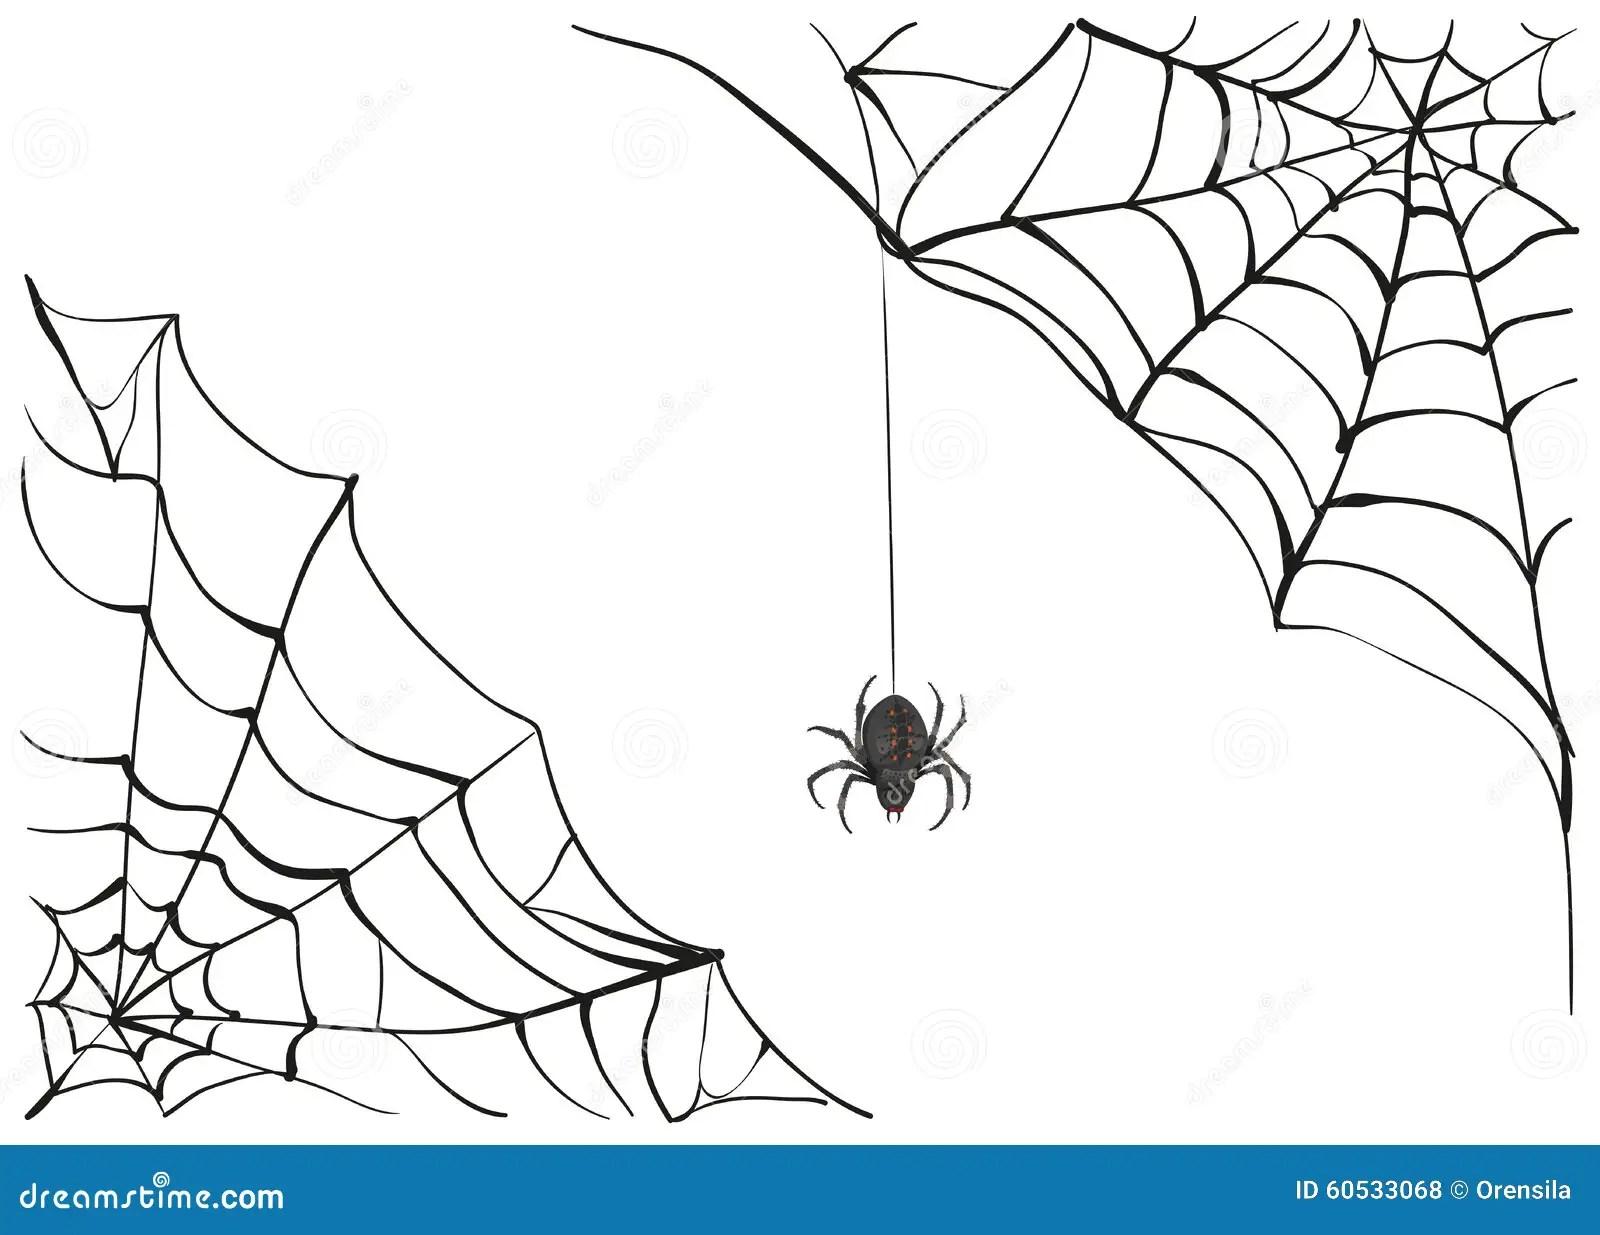 Spiderweb. Big Black Spider Web. Black Scary Spider Of Web